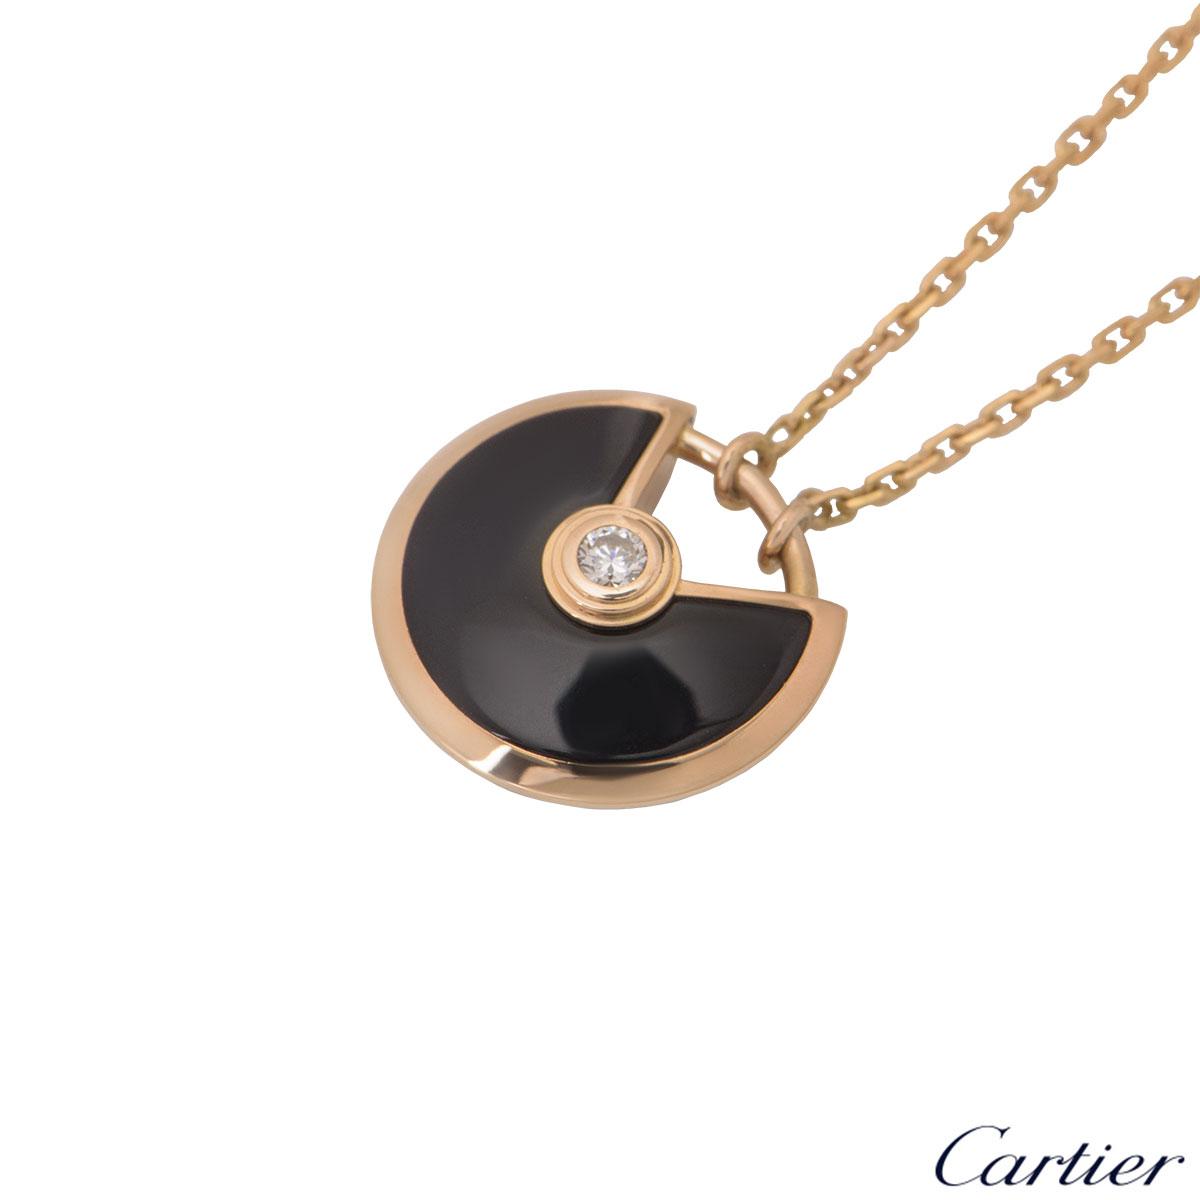 Cartier Rose Gold Diamond & Onyx Amulette De Cartier Pendant